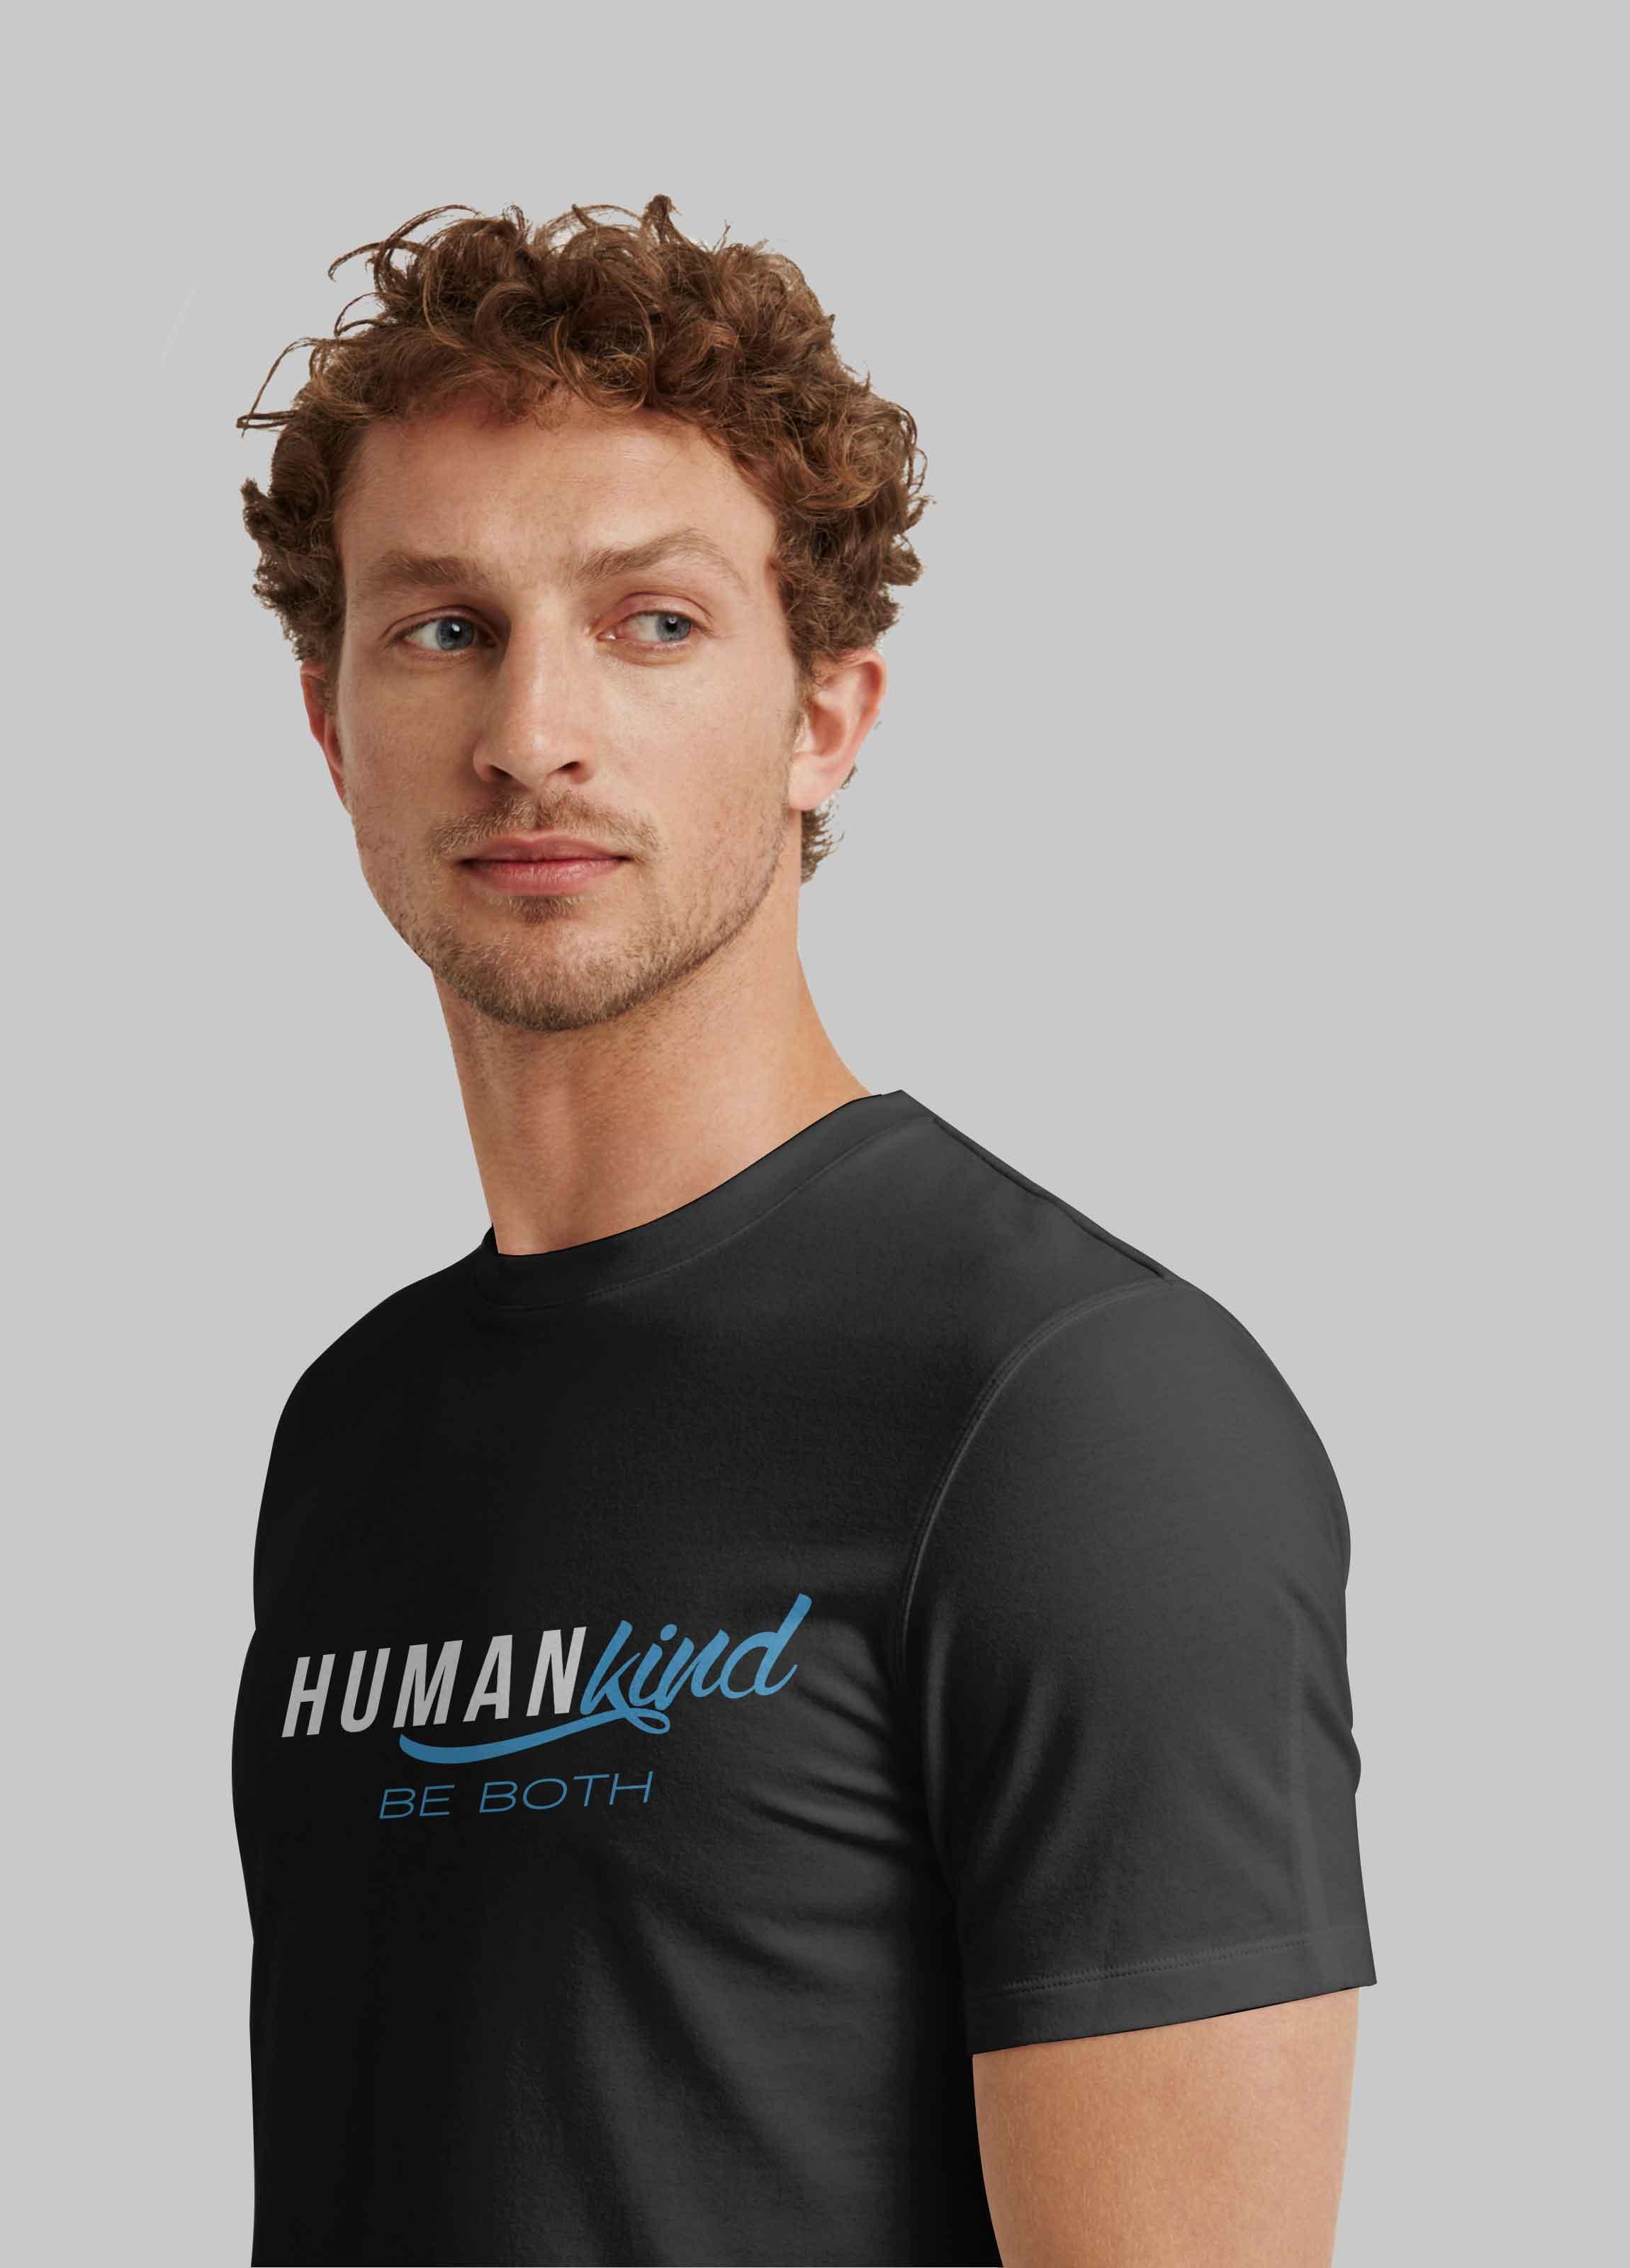 """Human Kind"" T-Shirt - $20"